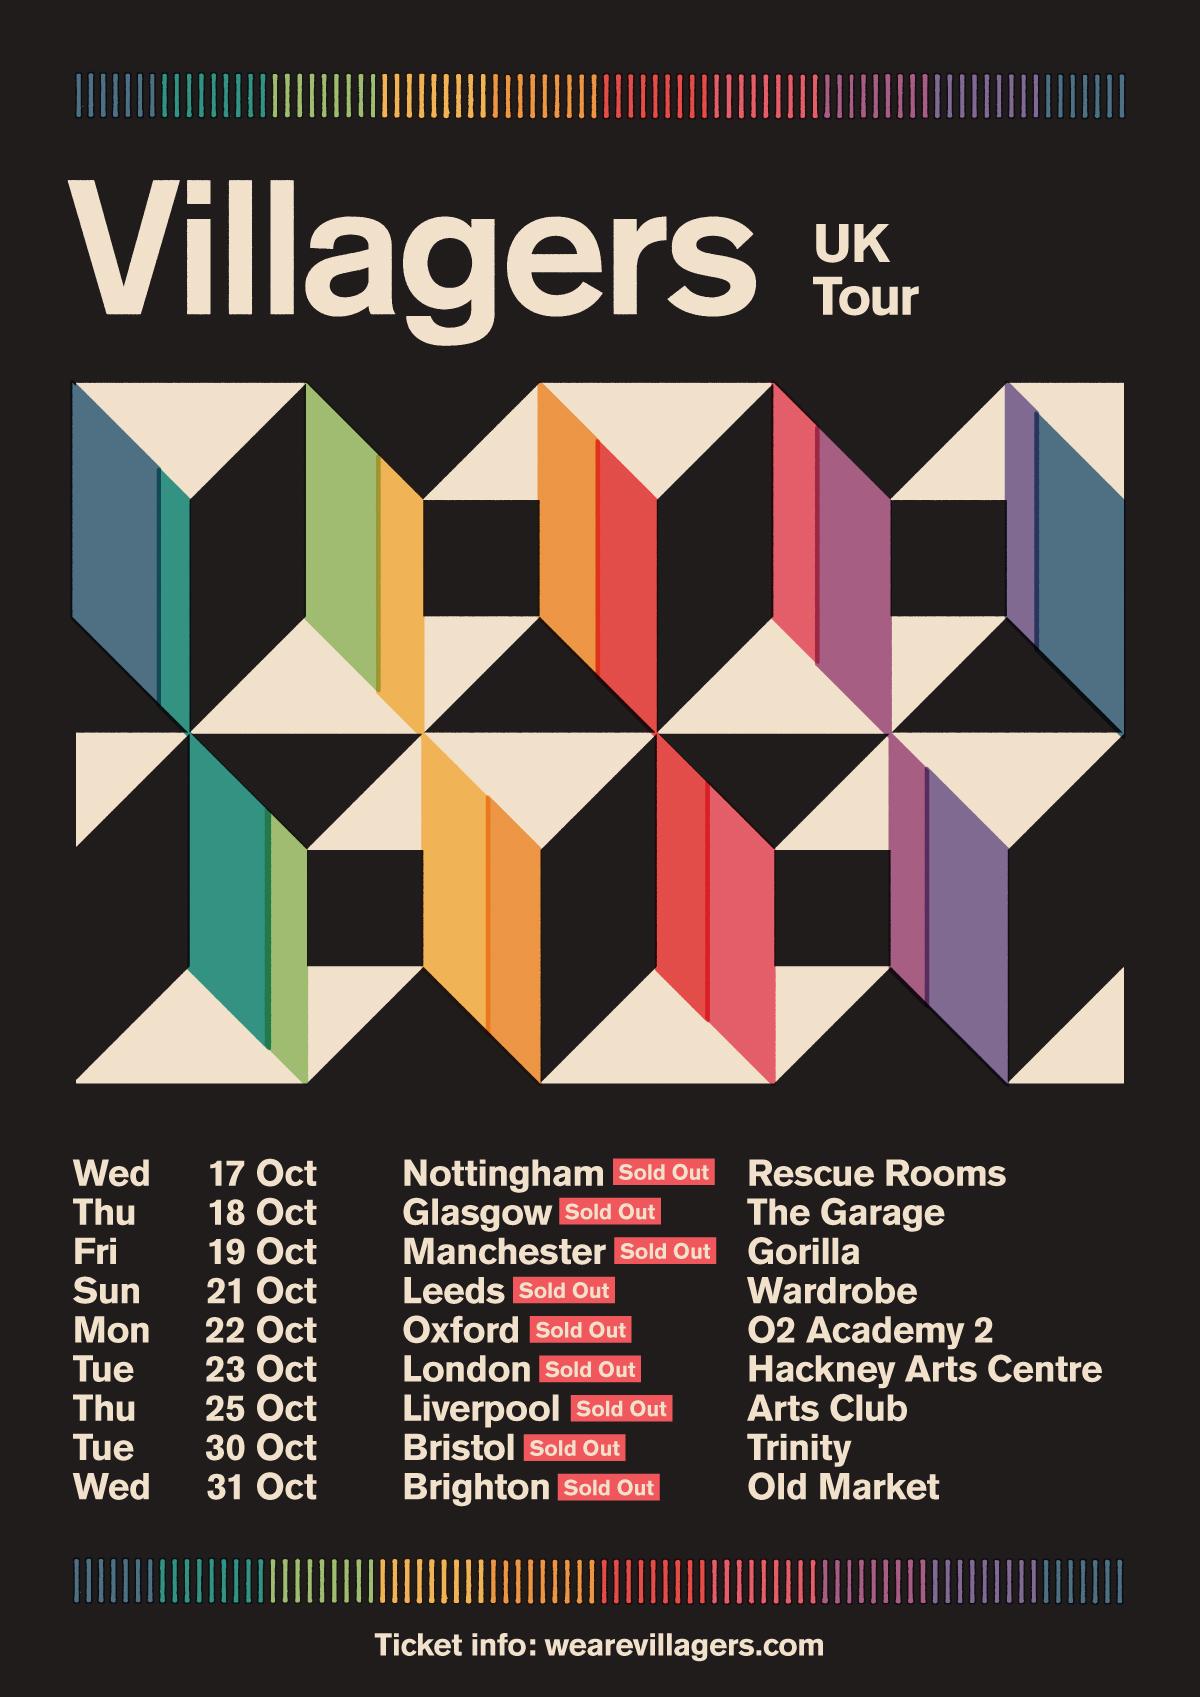 Villagers-UKTour-Poster-SoldOut.jpg